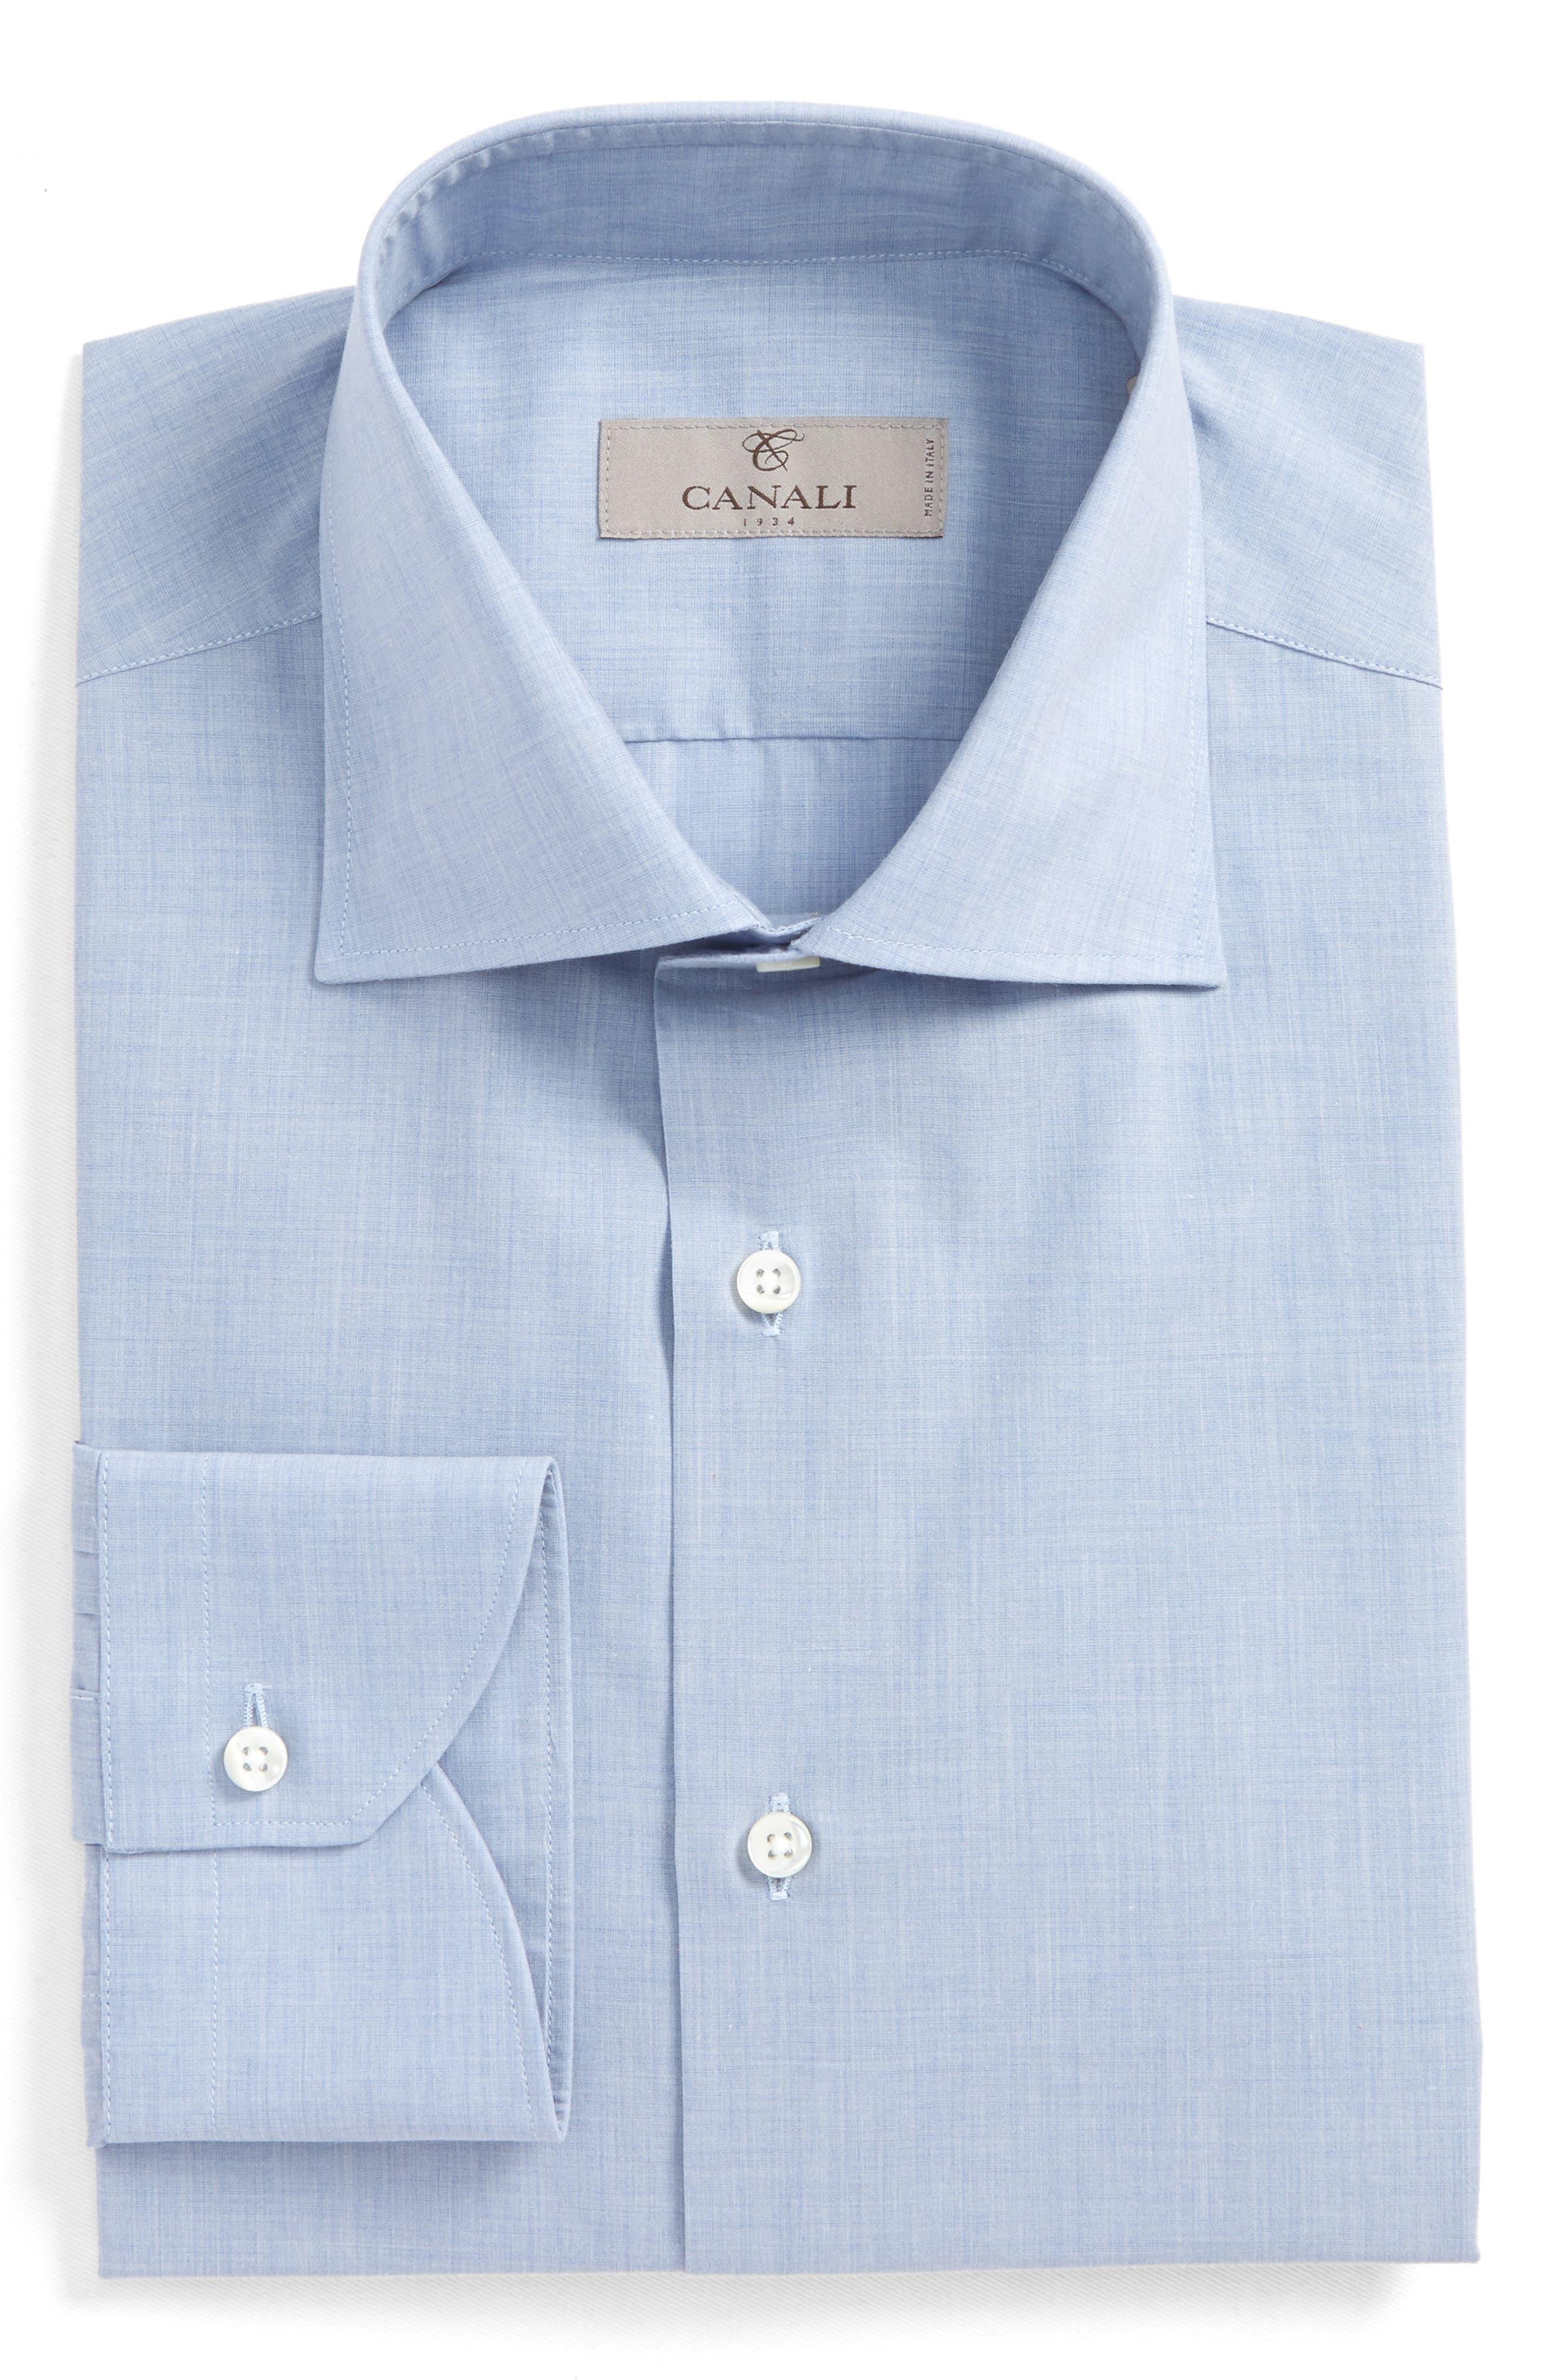 Regular Fit Solid Dress Shirt,                             Main thumbnail 1, color,                             Med Blue